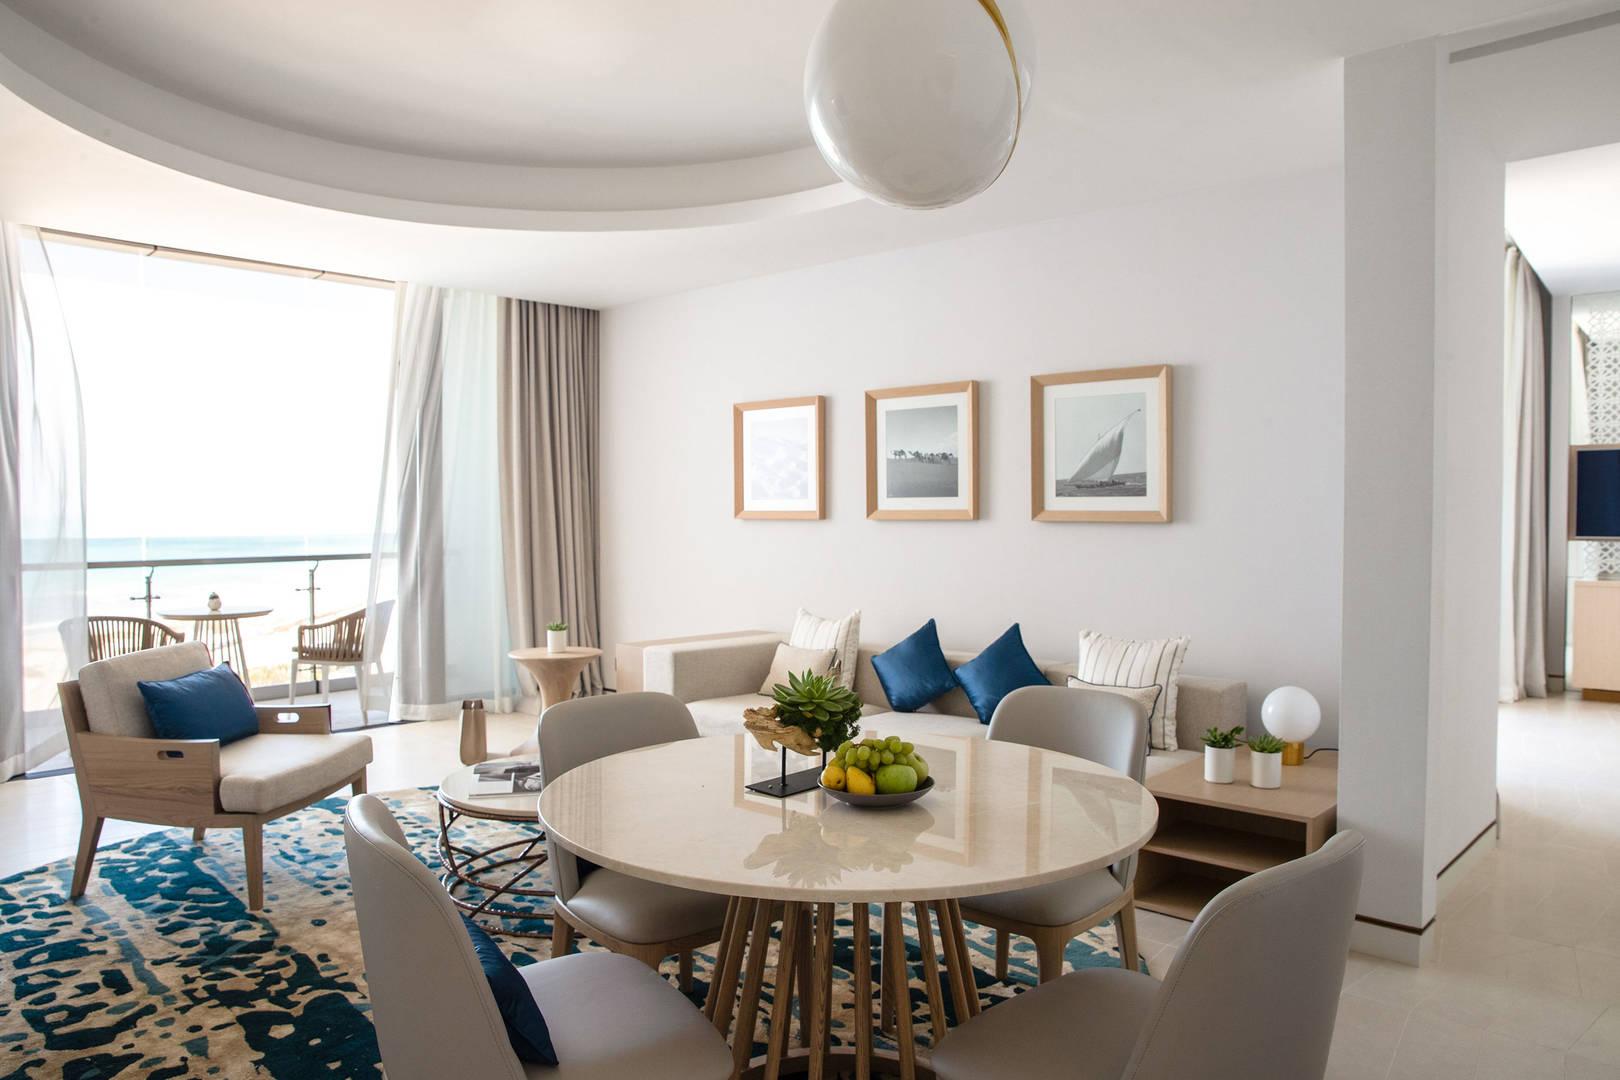 View at the living room of the Family Suite at Jumeirah Saadiyat Island Resort